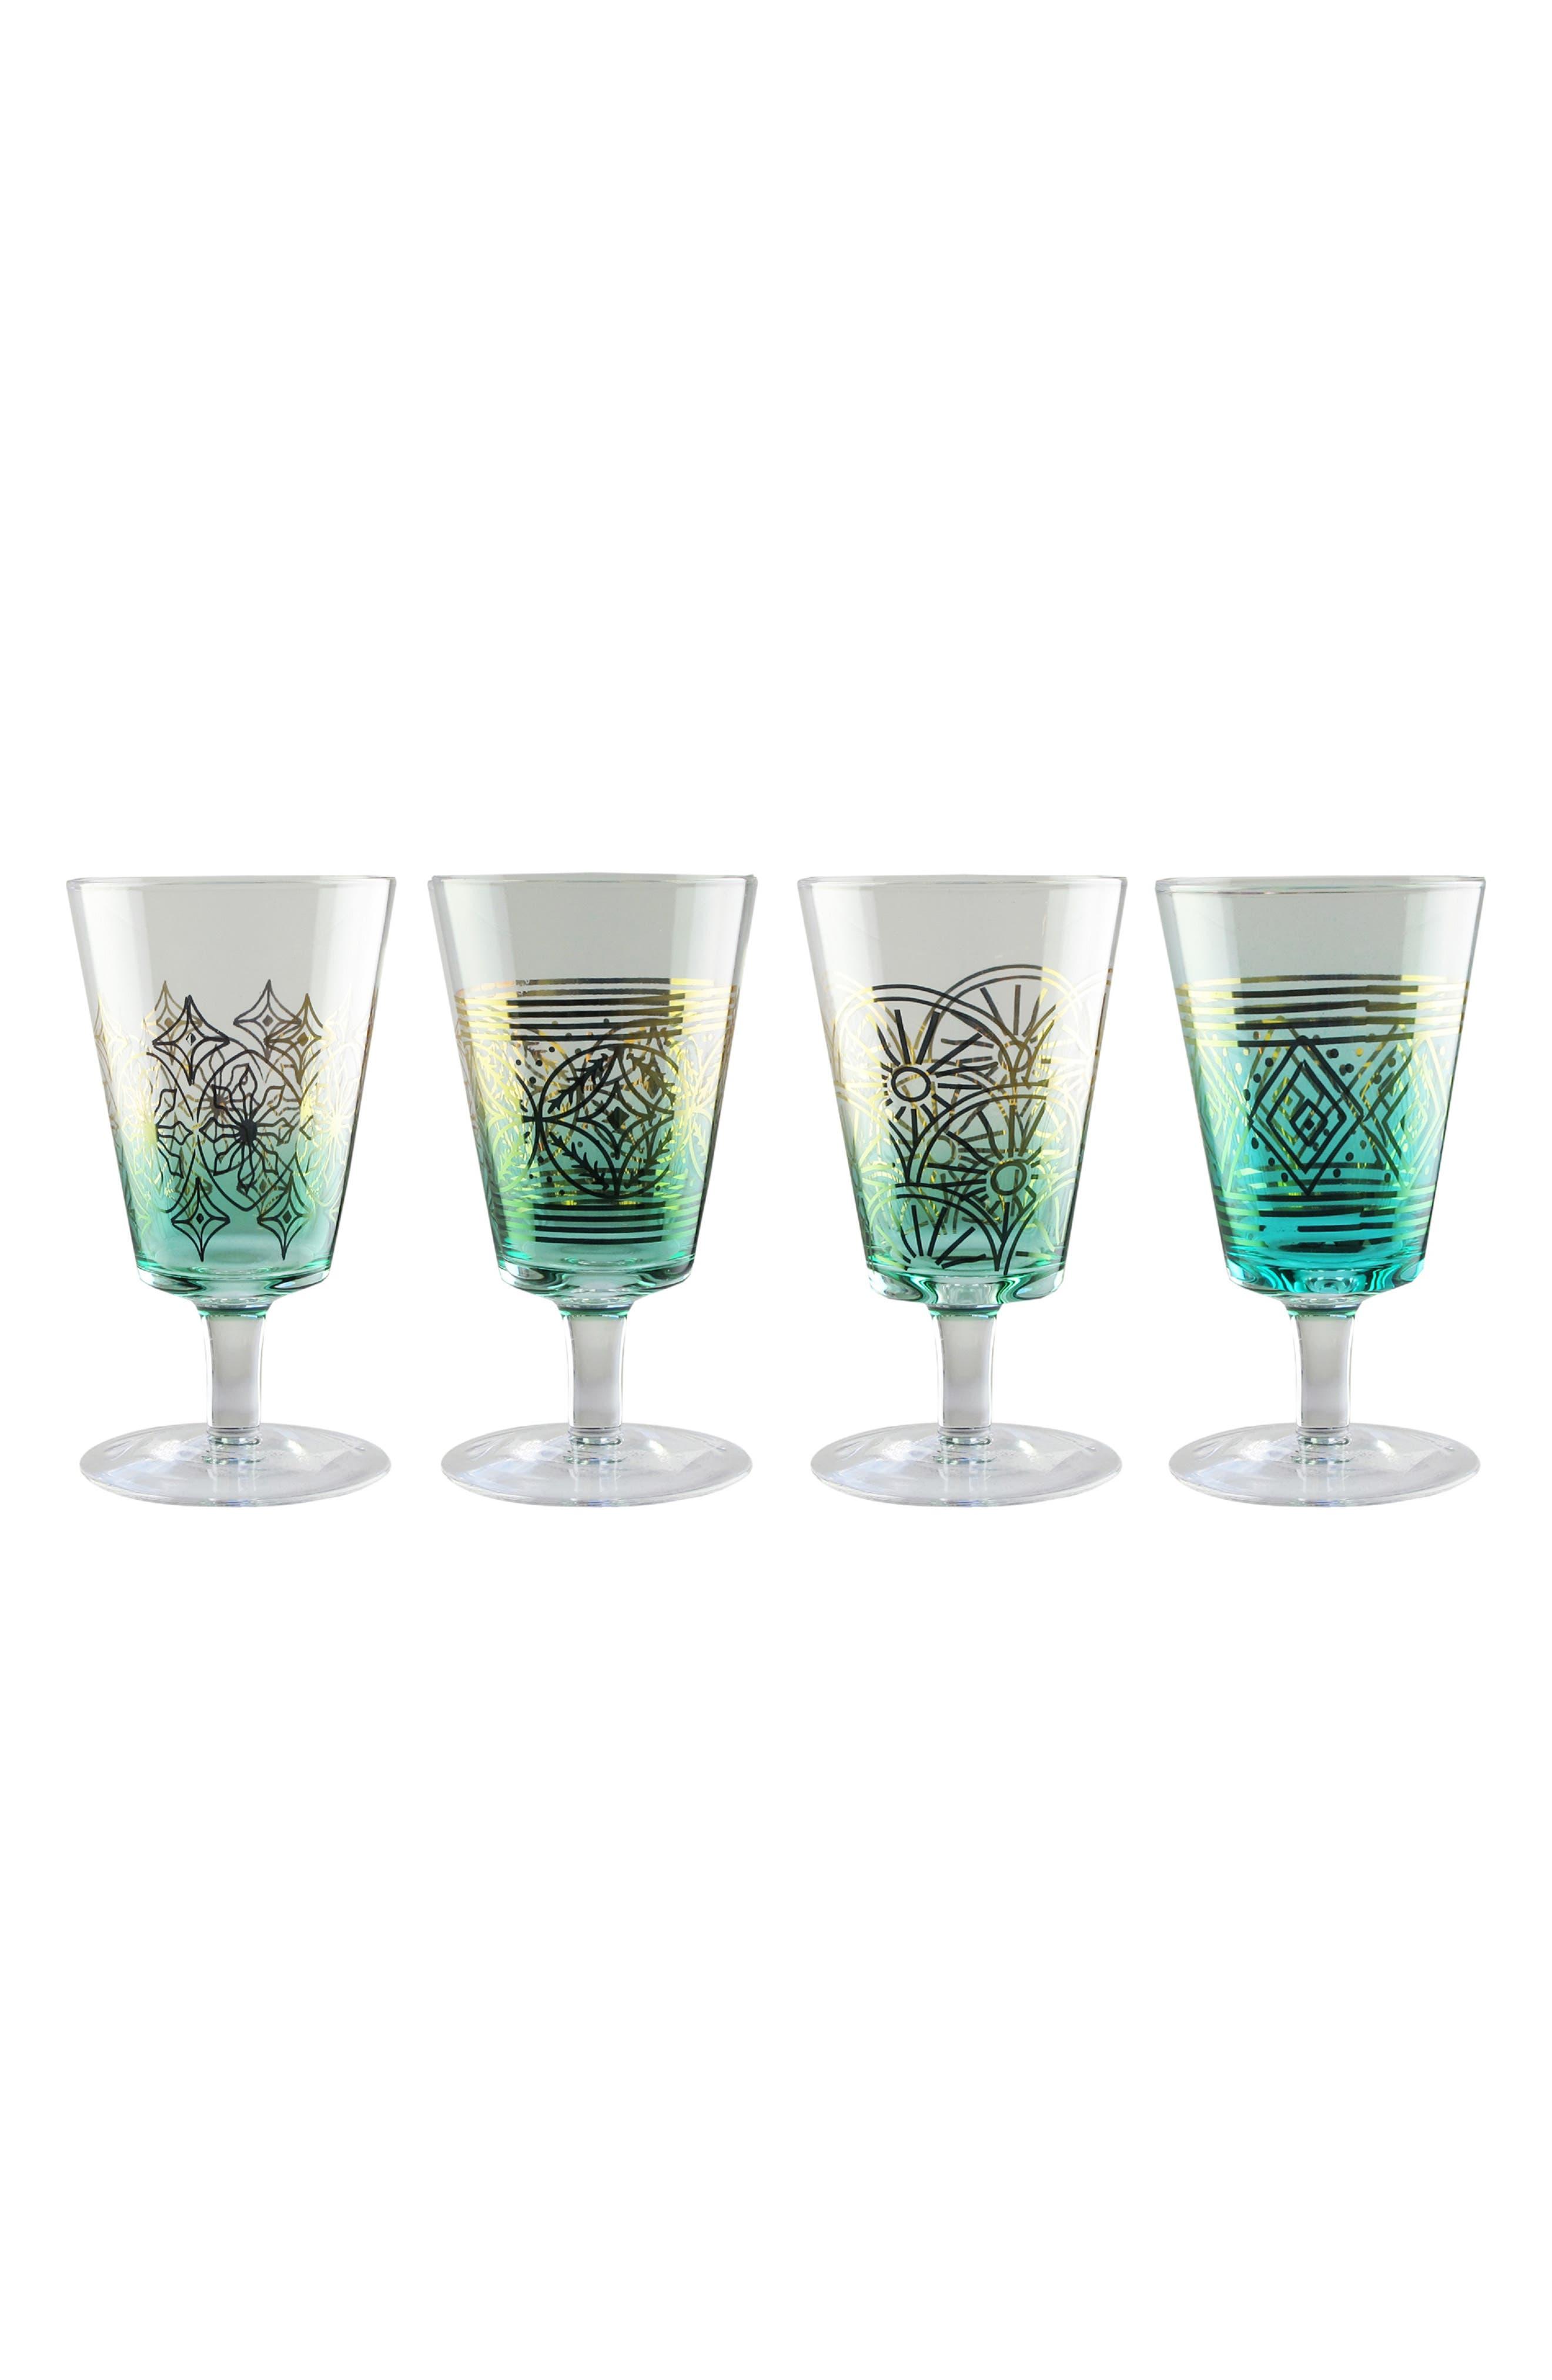 Soirée Set of 4 Wine Glasses,                             Main thumbnail 1, color,                             TEAL/ GOLD